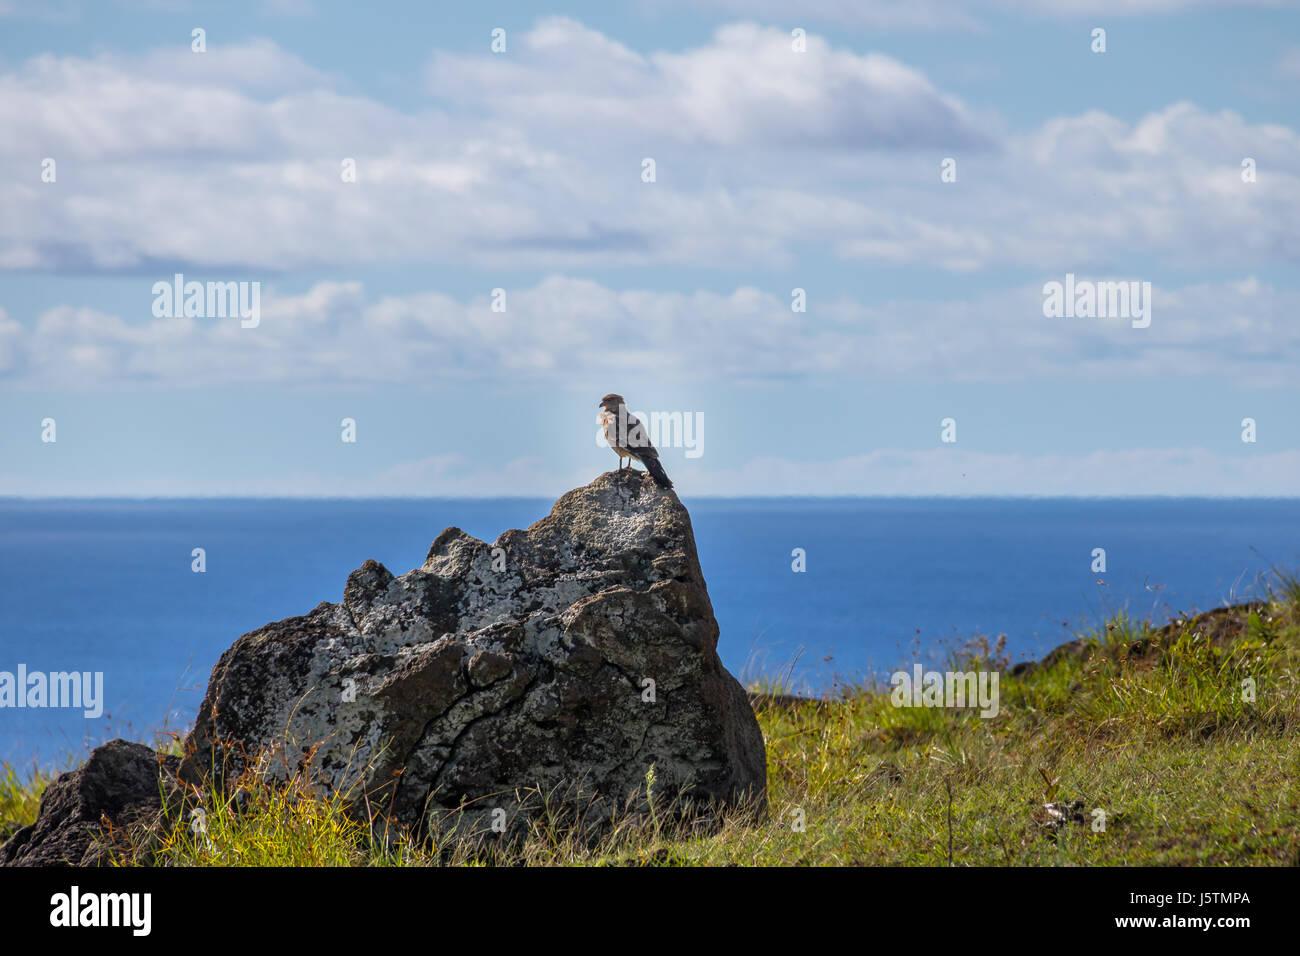 Chimango caracara falcon - Easter Island, Chile - Stock Image